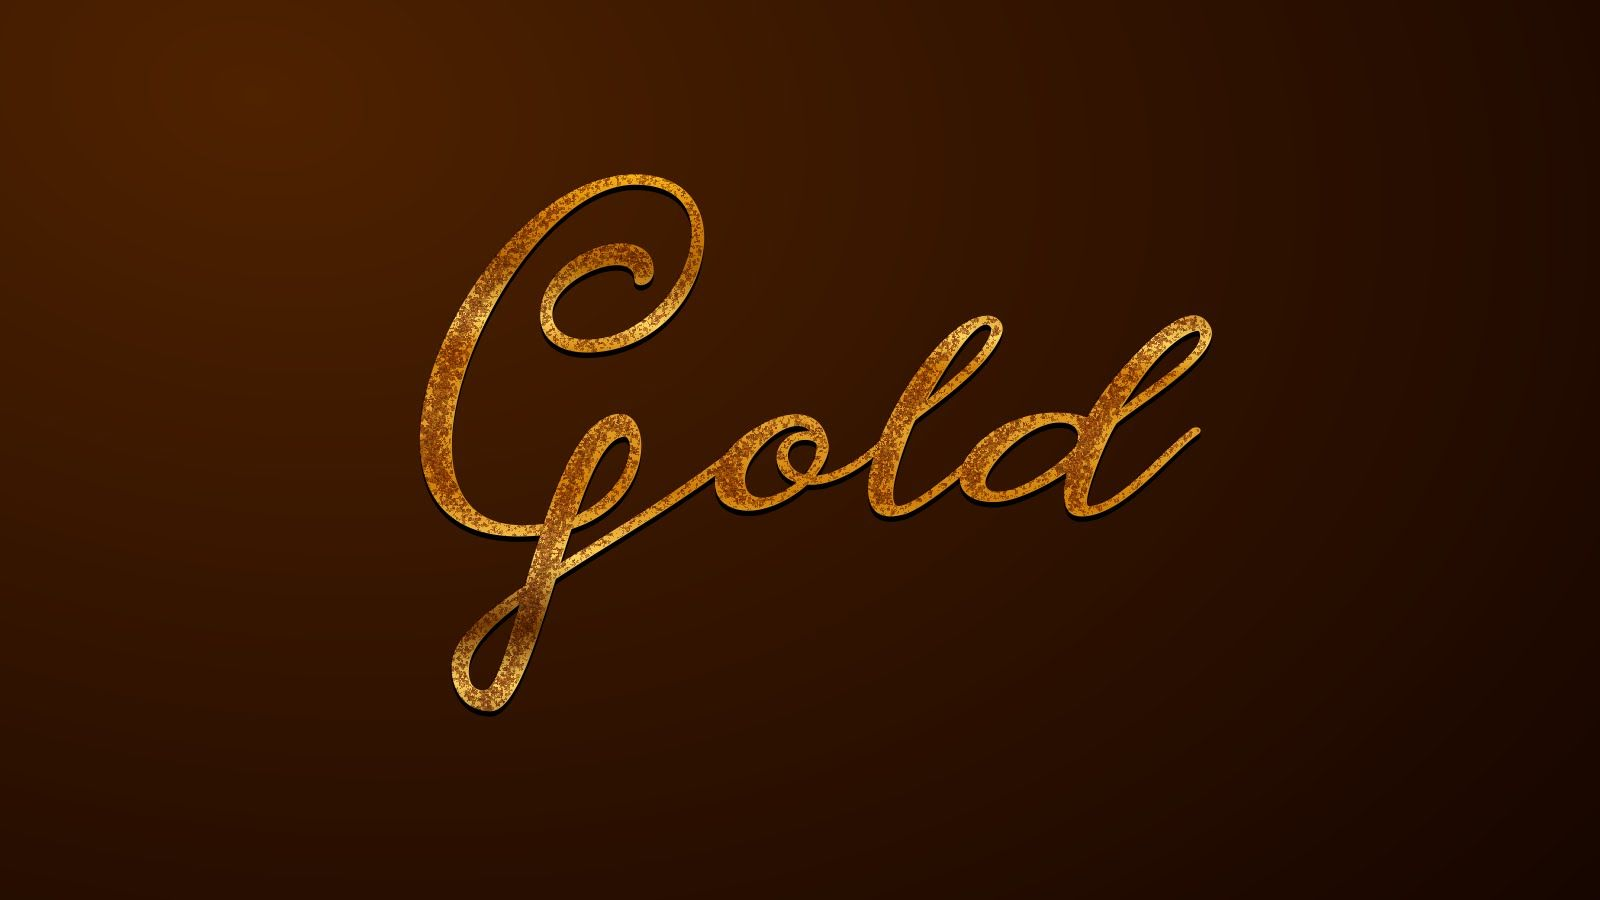 Gold Foil: CorelDraw Text Effect Tutorial #7 | coreldraw